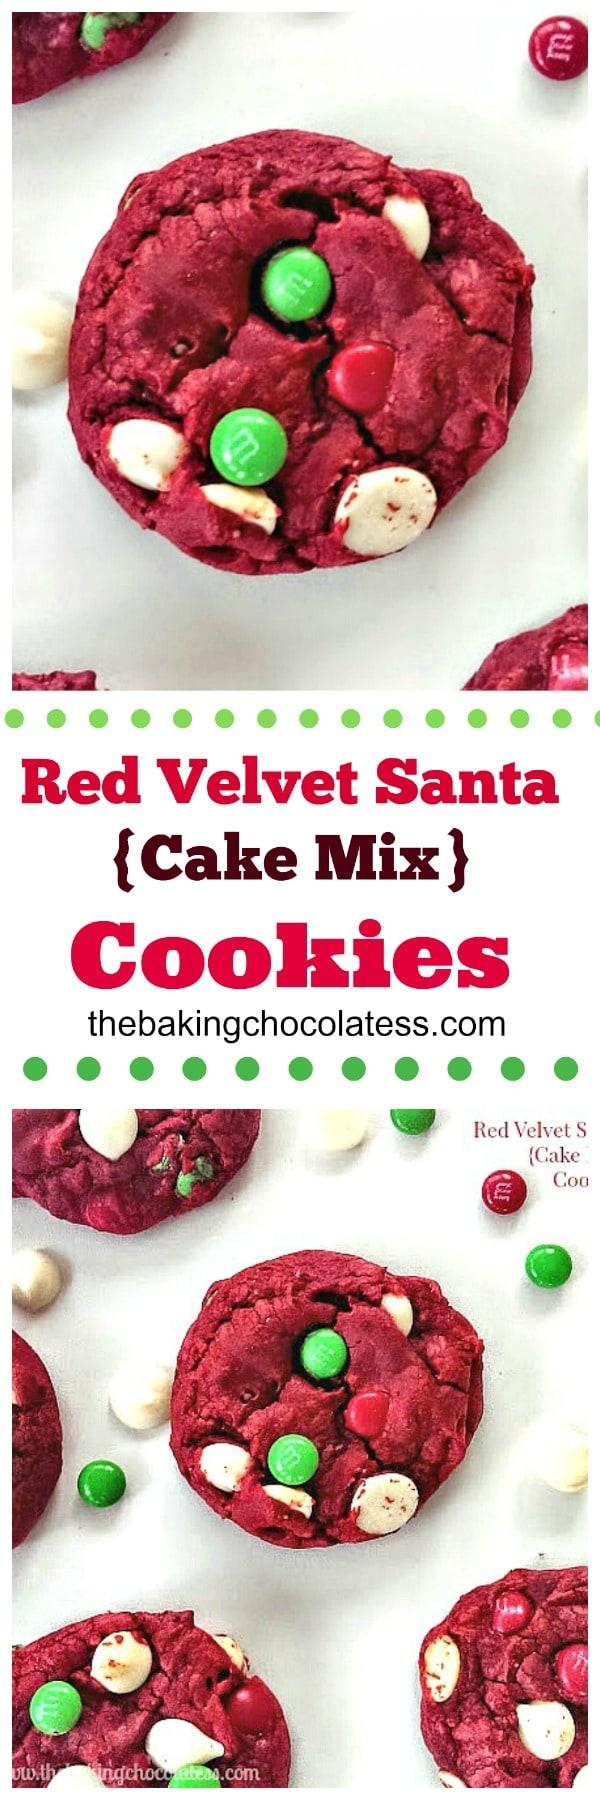 Red Velvet Santa {Cake Mix} Cookies